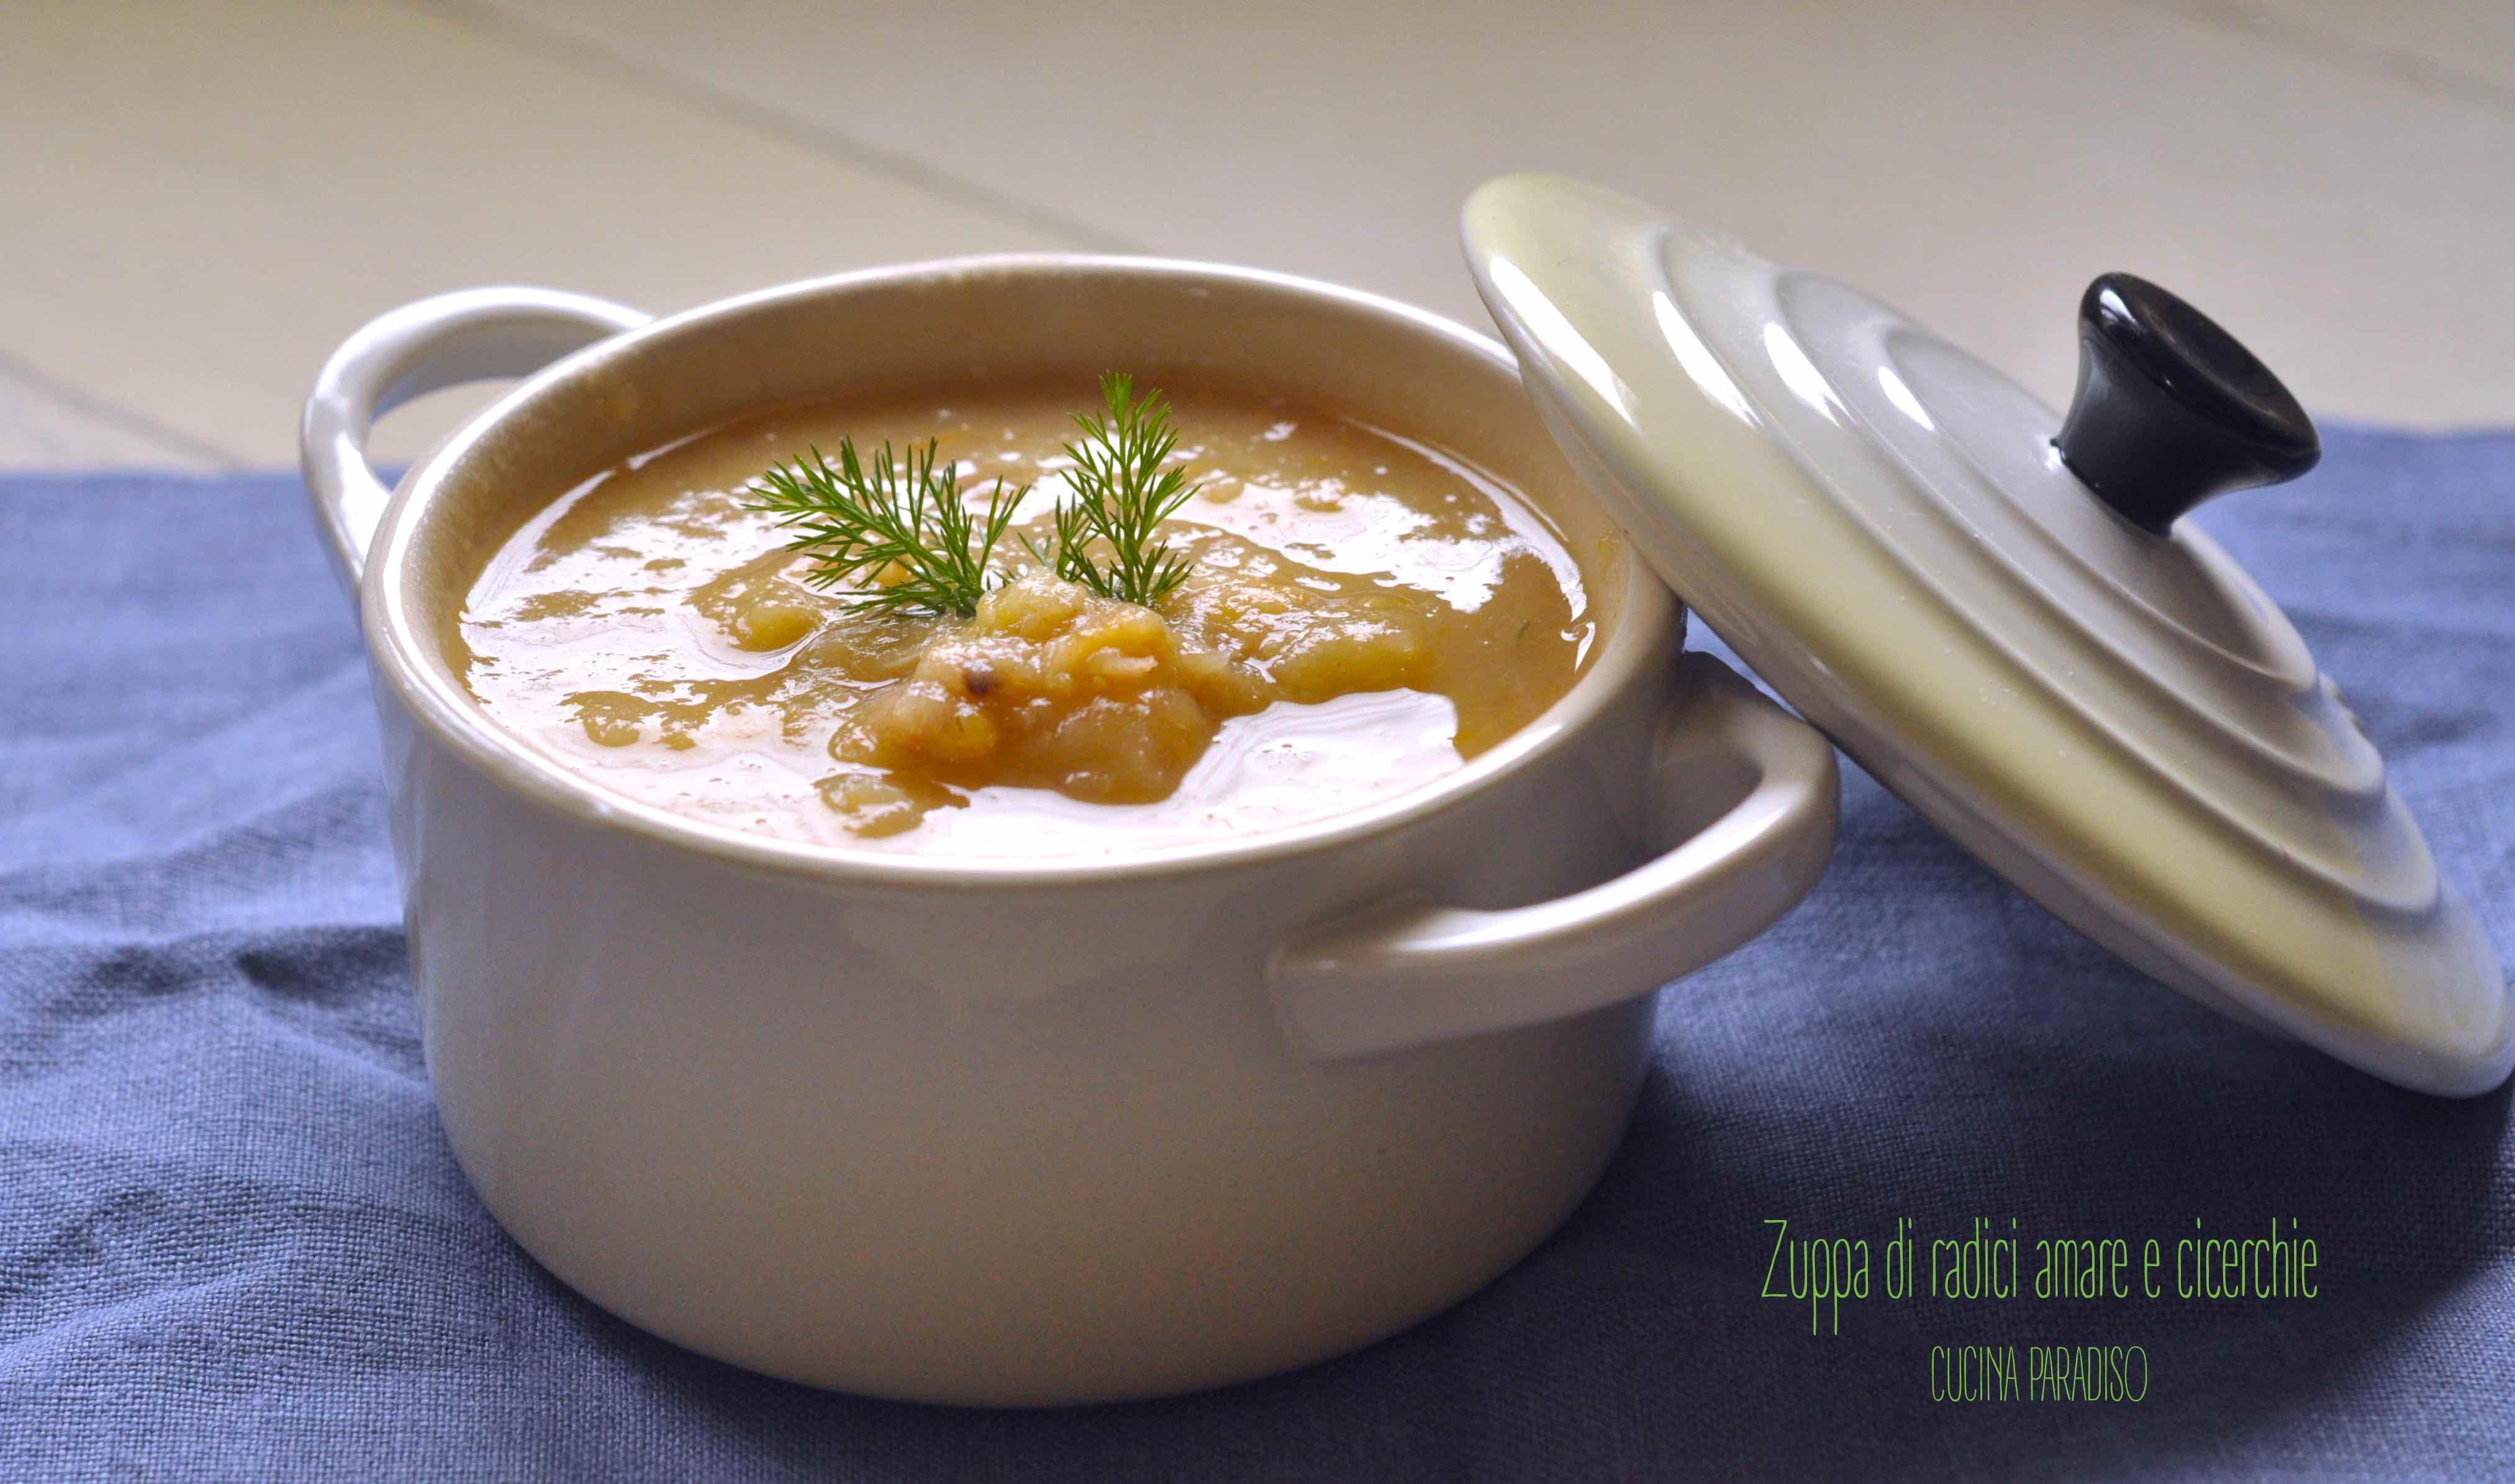 zuppa-di-radici-amare-e-cicerchie